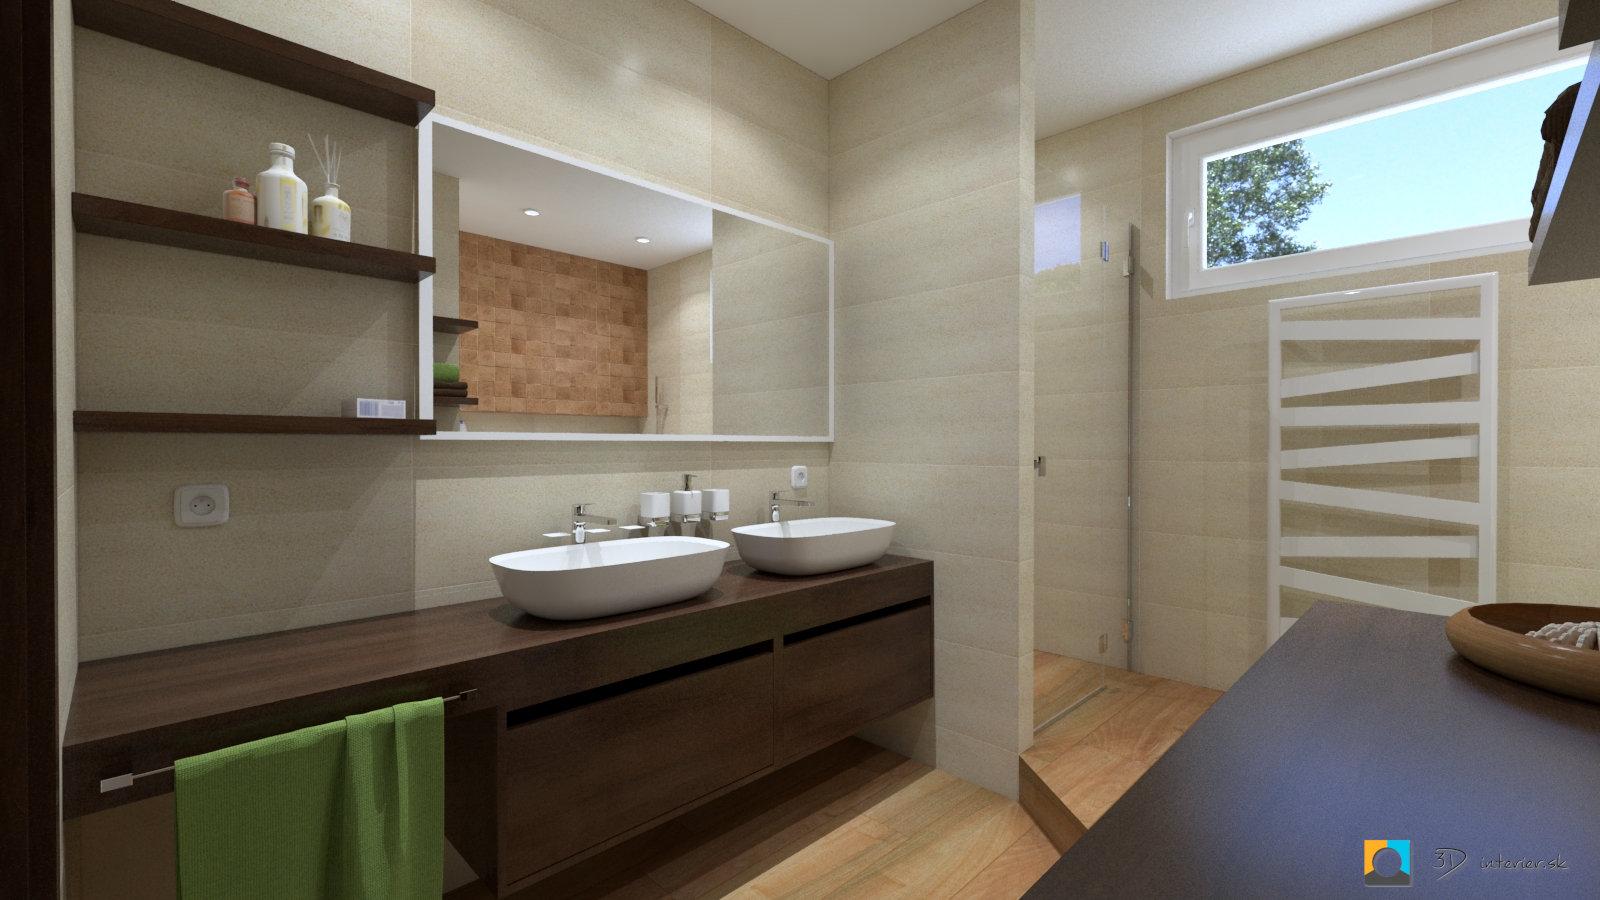 dizajn kúpeľne sabinov